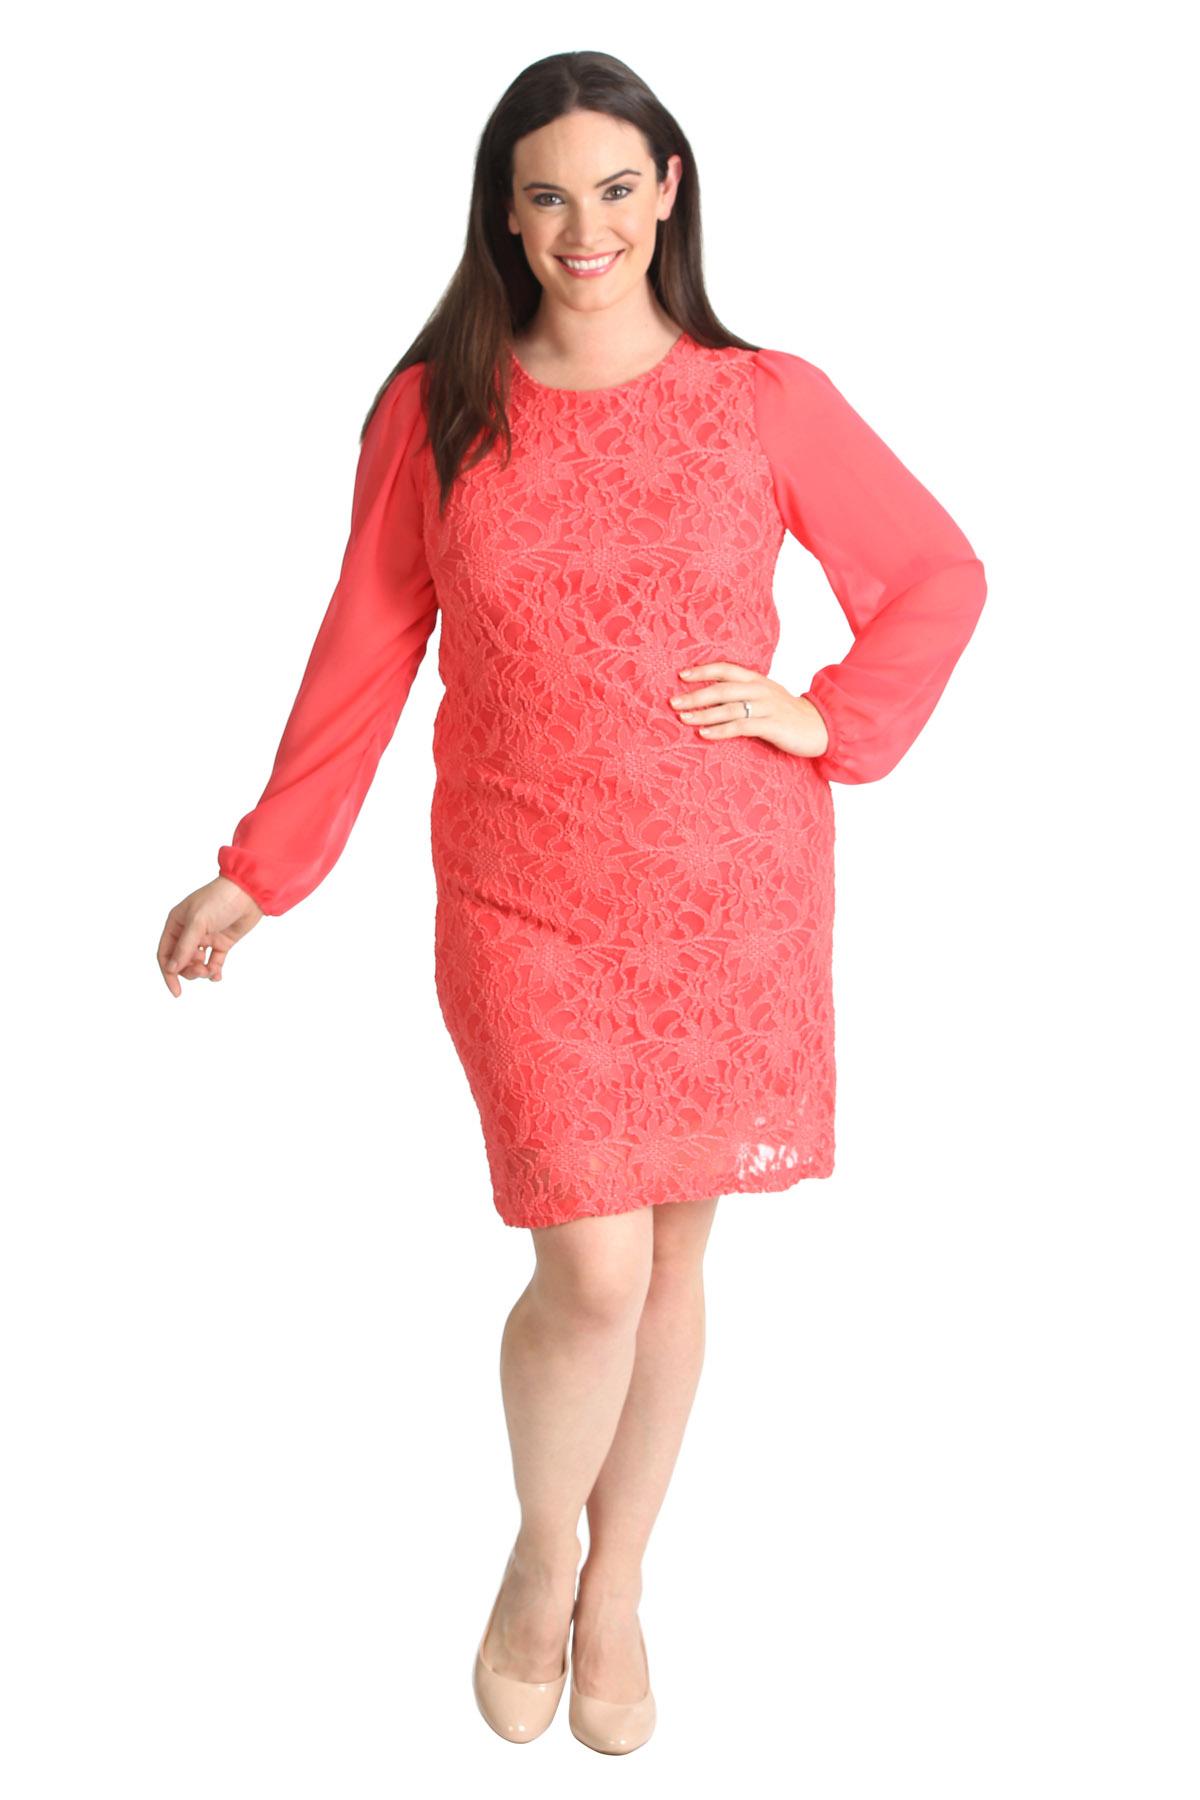 New Ladies Plus Size Dress Womens Floral Lace Chiffon ...